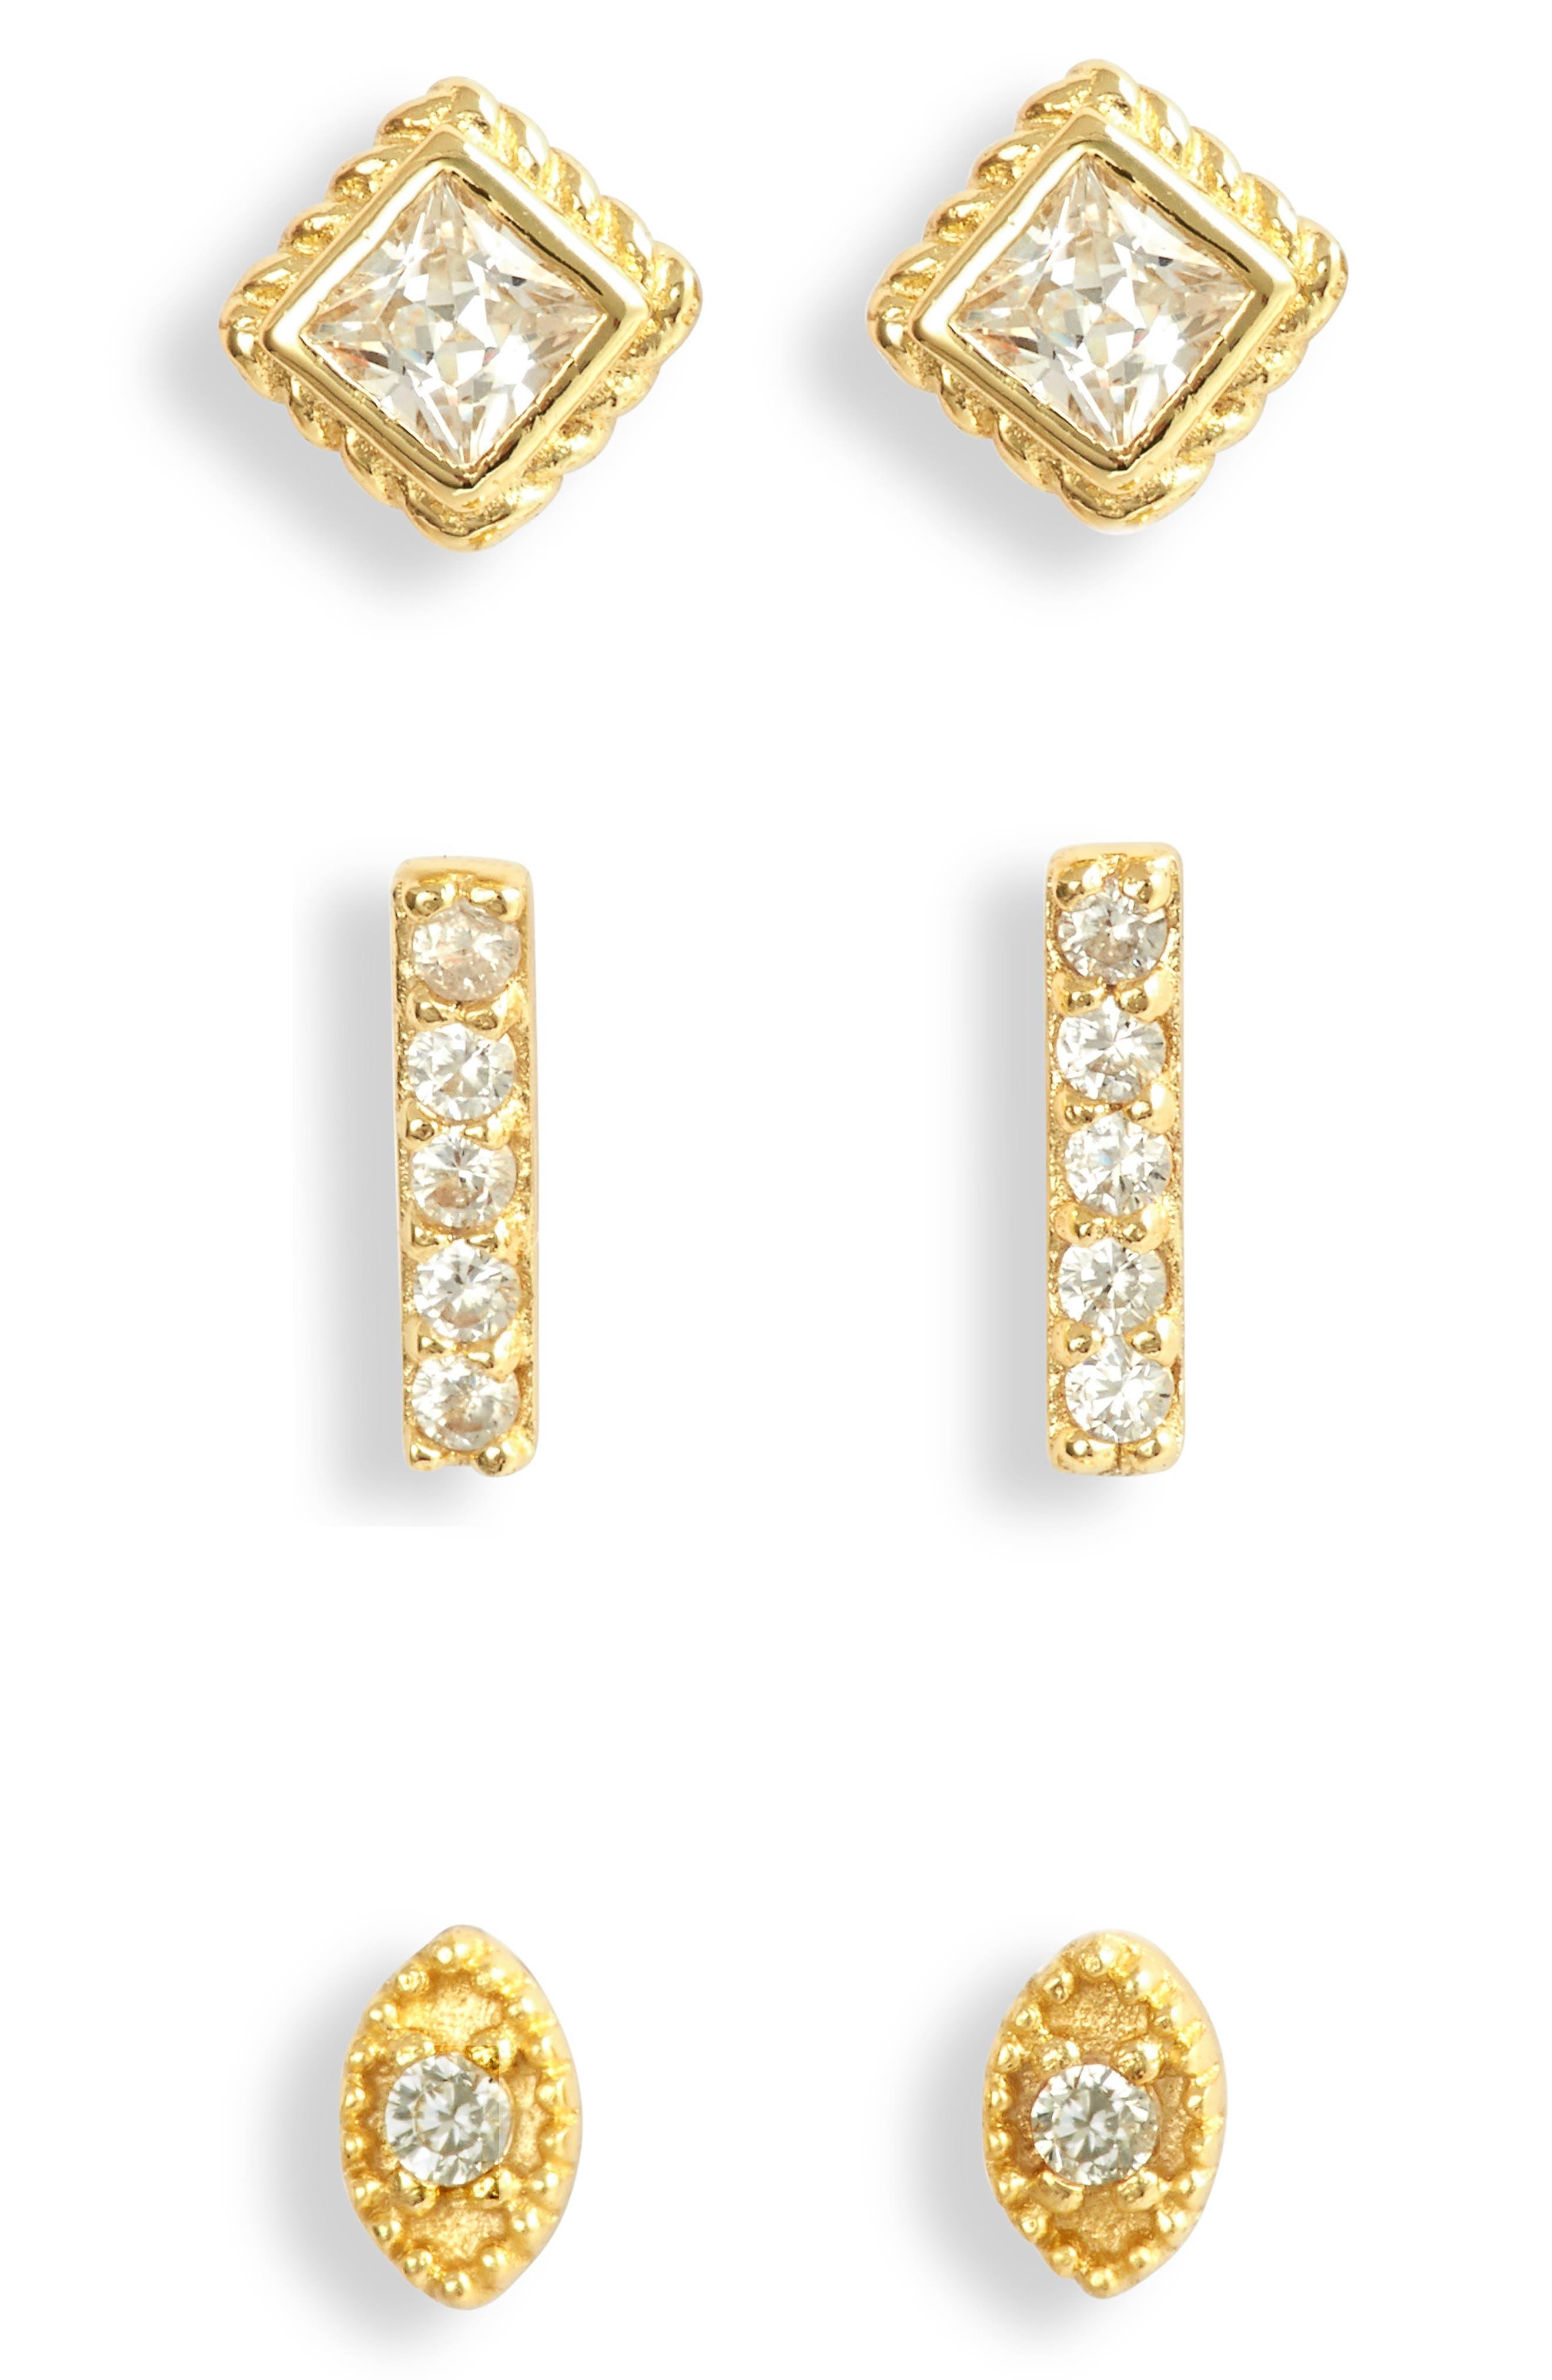 Set Of 3 Assorted Earrings